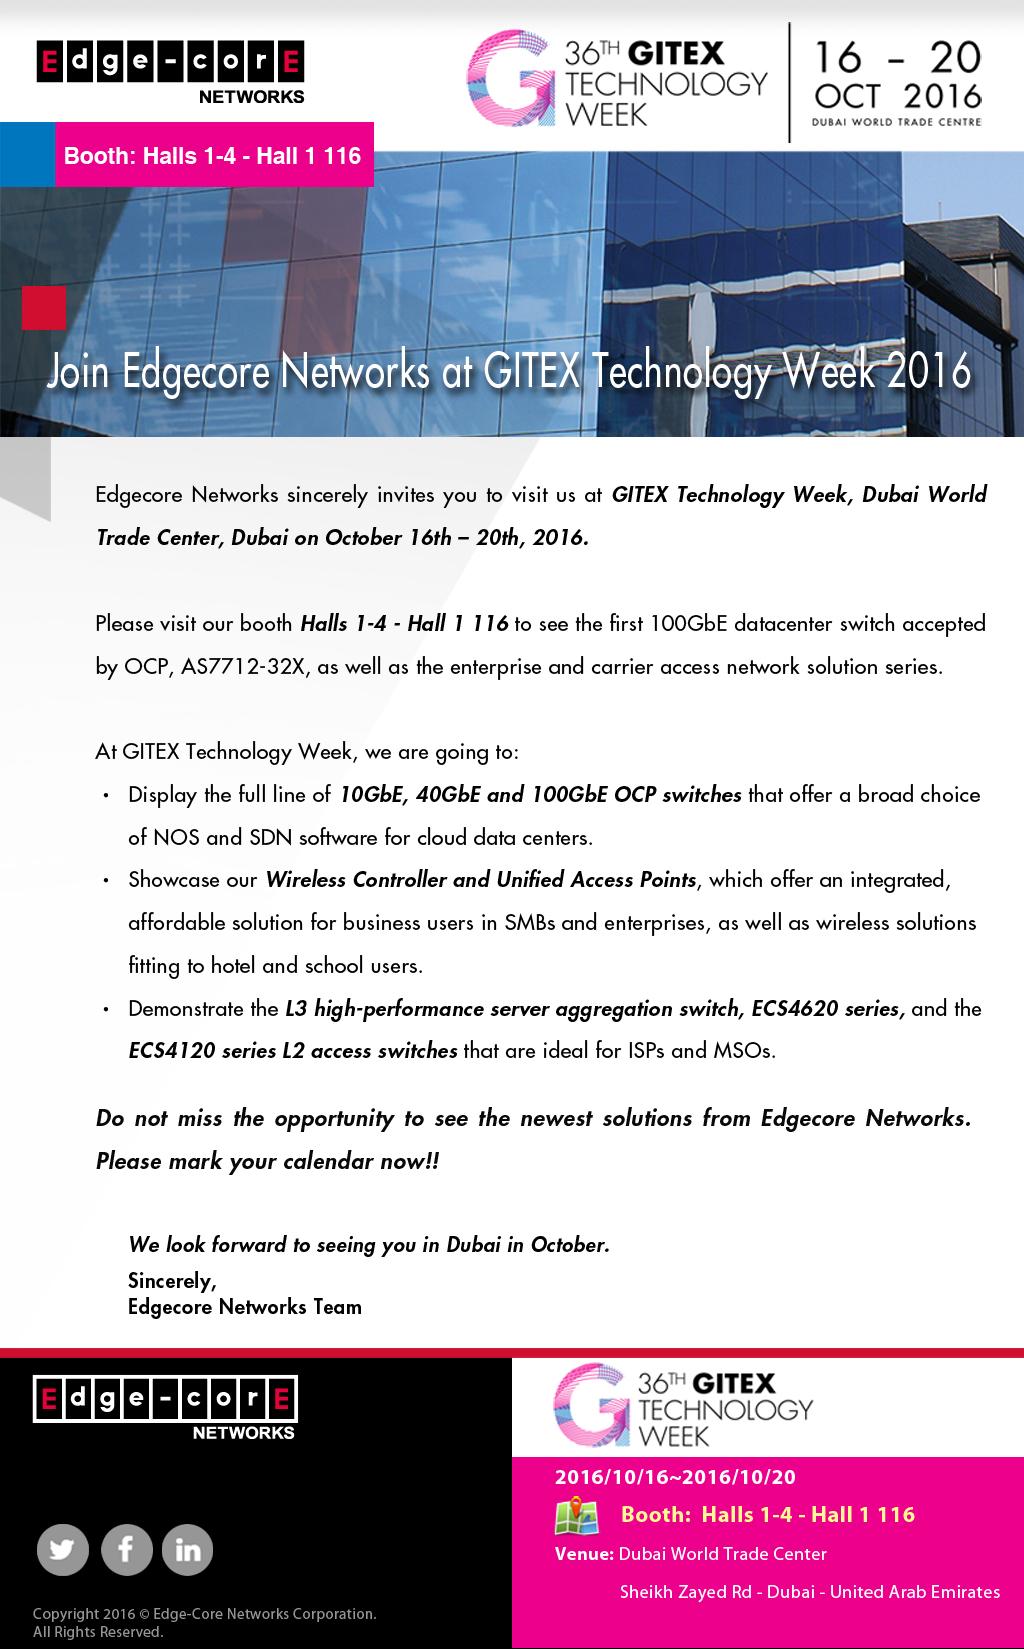 Join Edgecore Networks at GITEX Technology Week 2016-Edgecore Networks